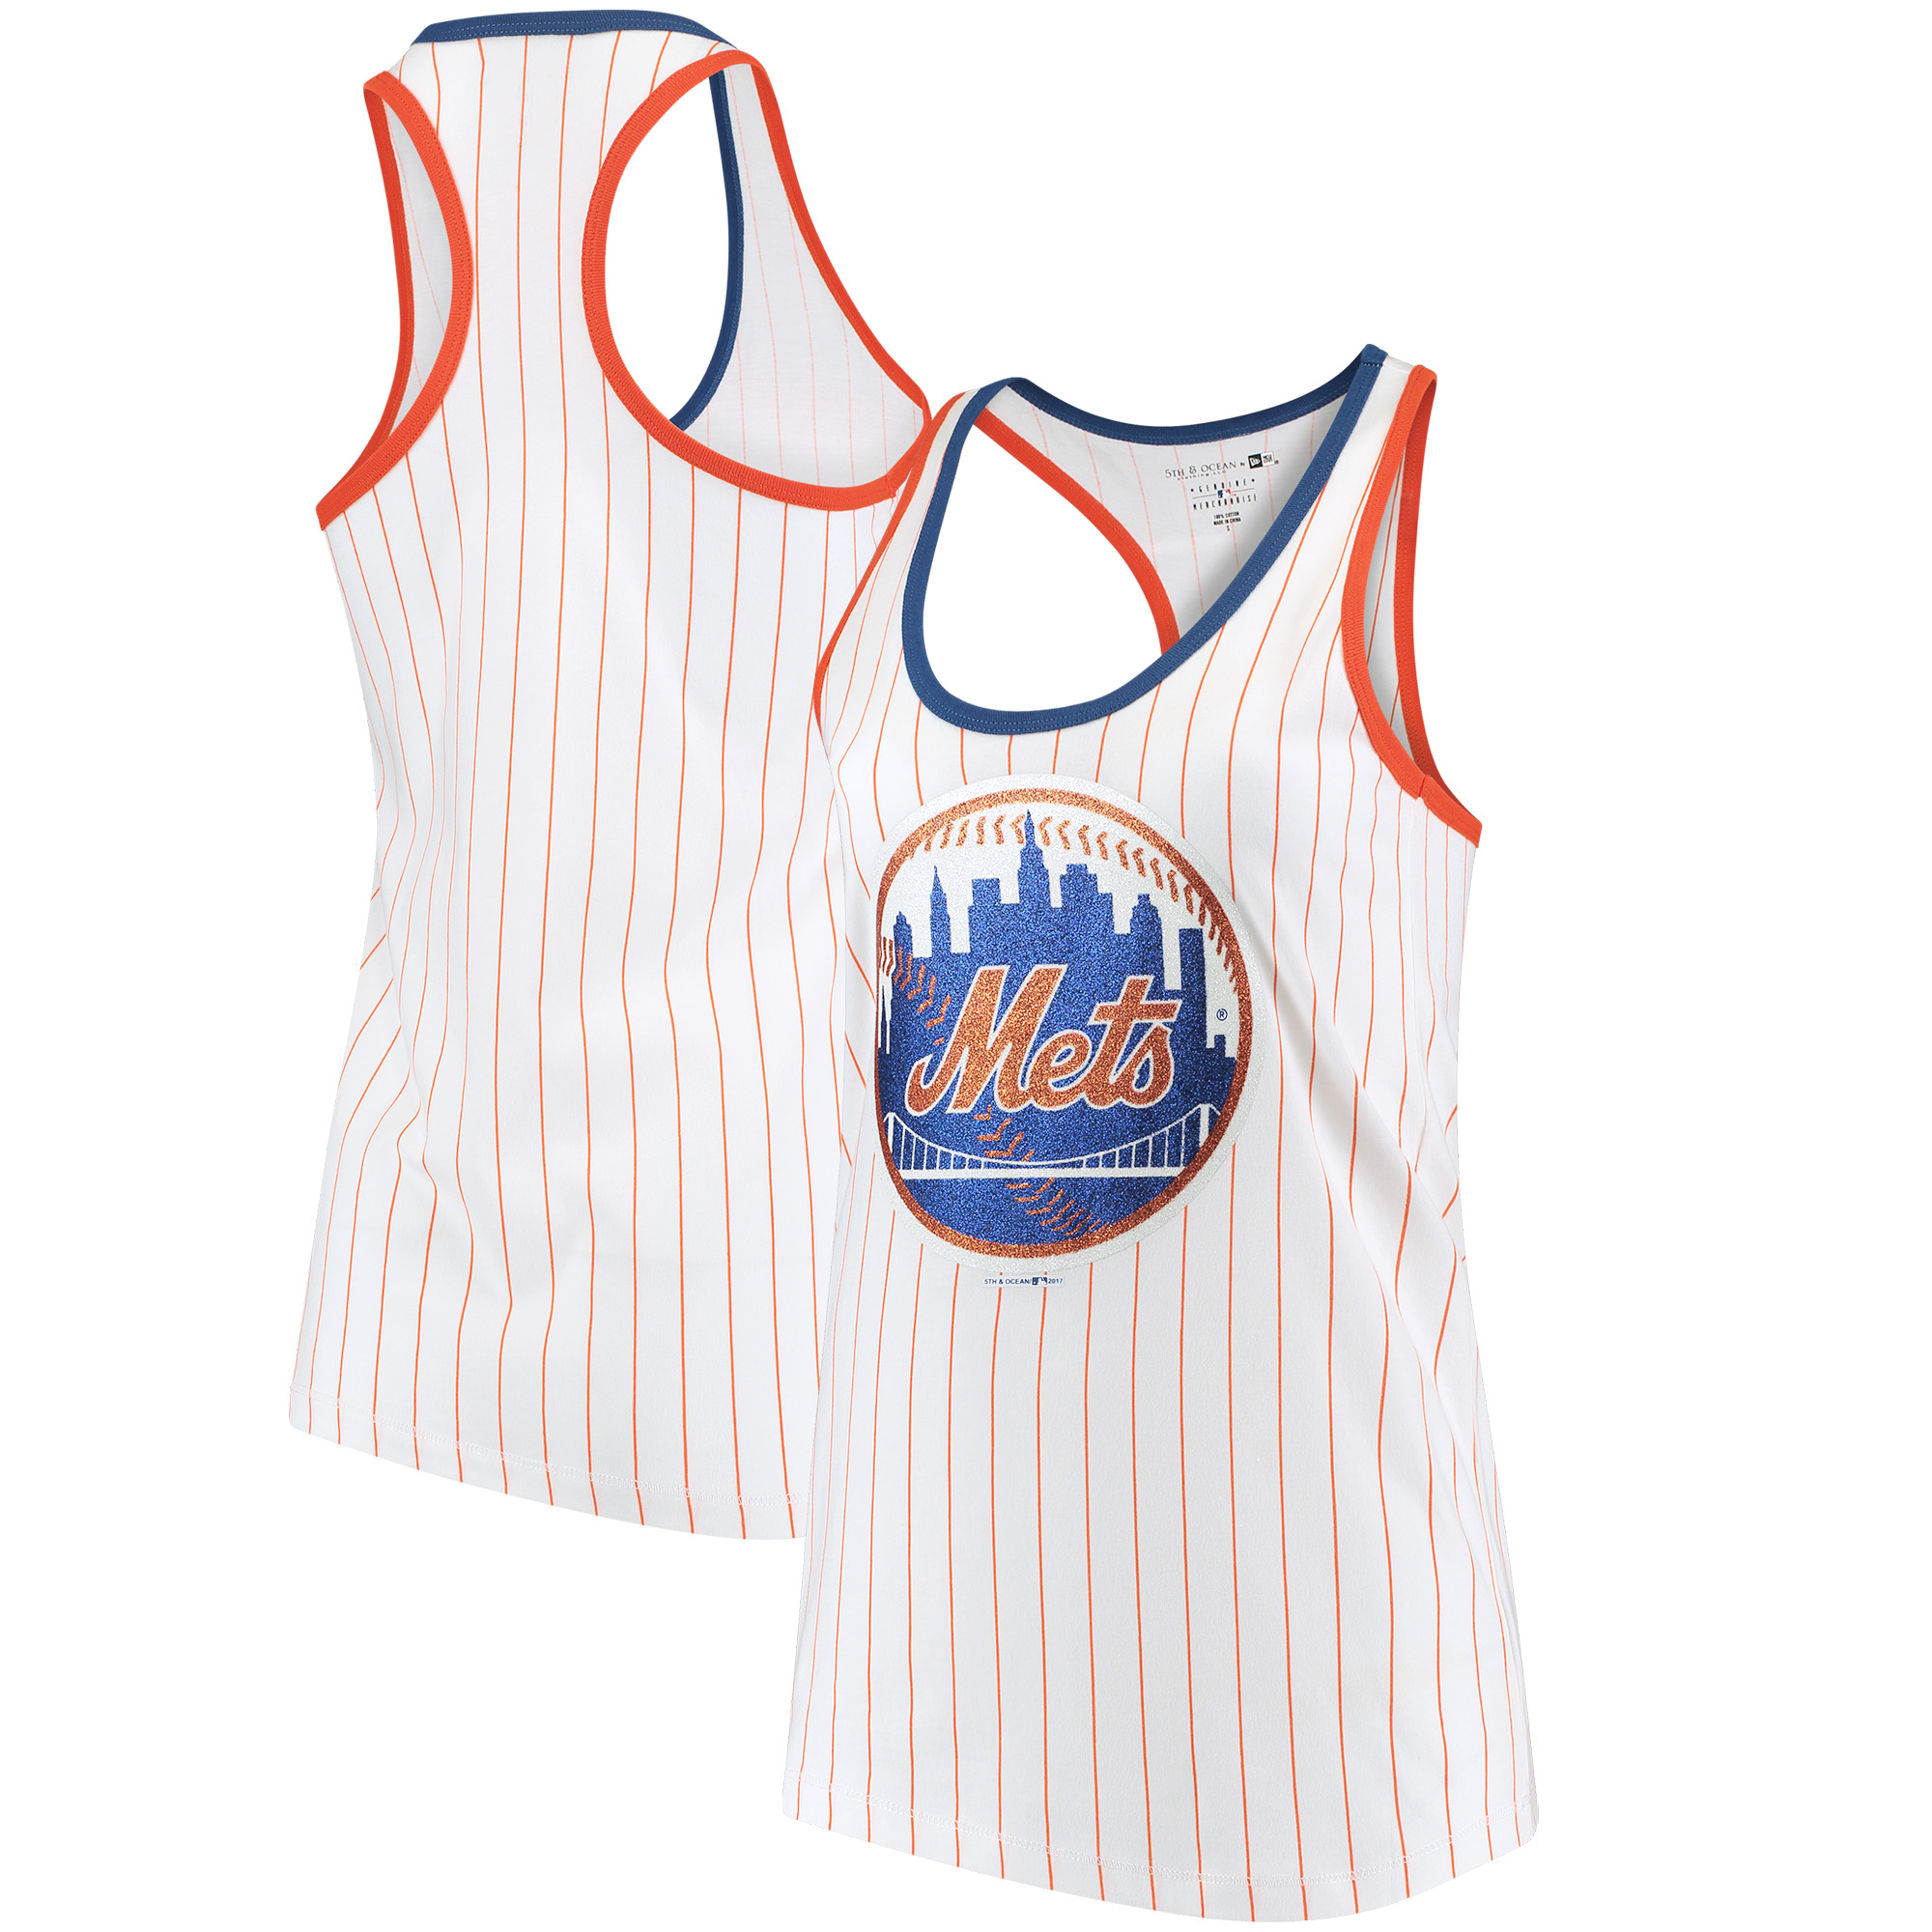 New York Mets 5th & Ocean by New Era Women's Pinstripe Racerback Tank Top - White/Orange